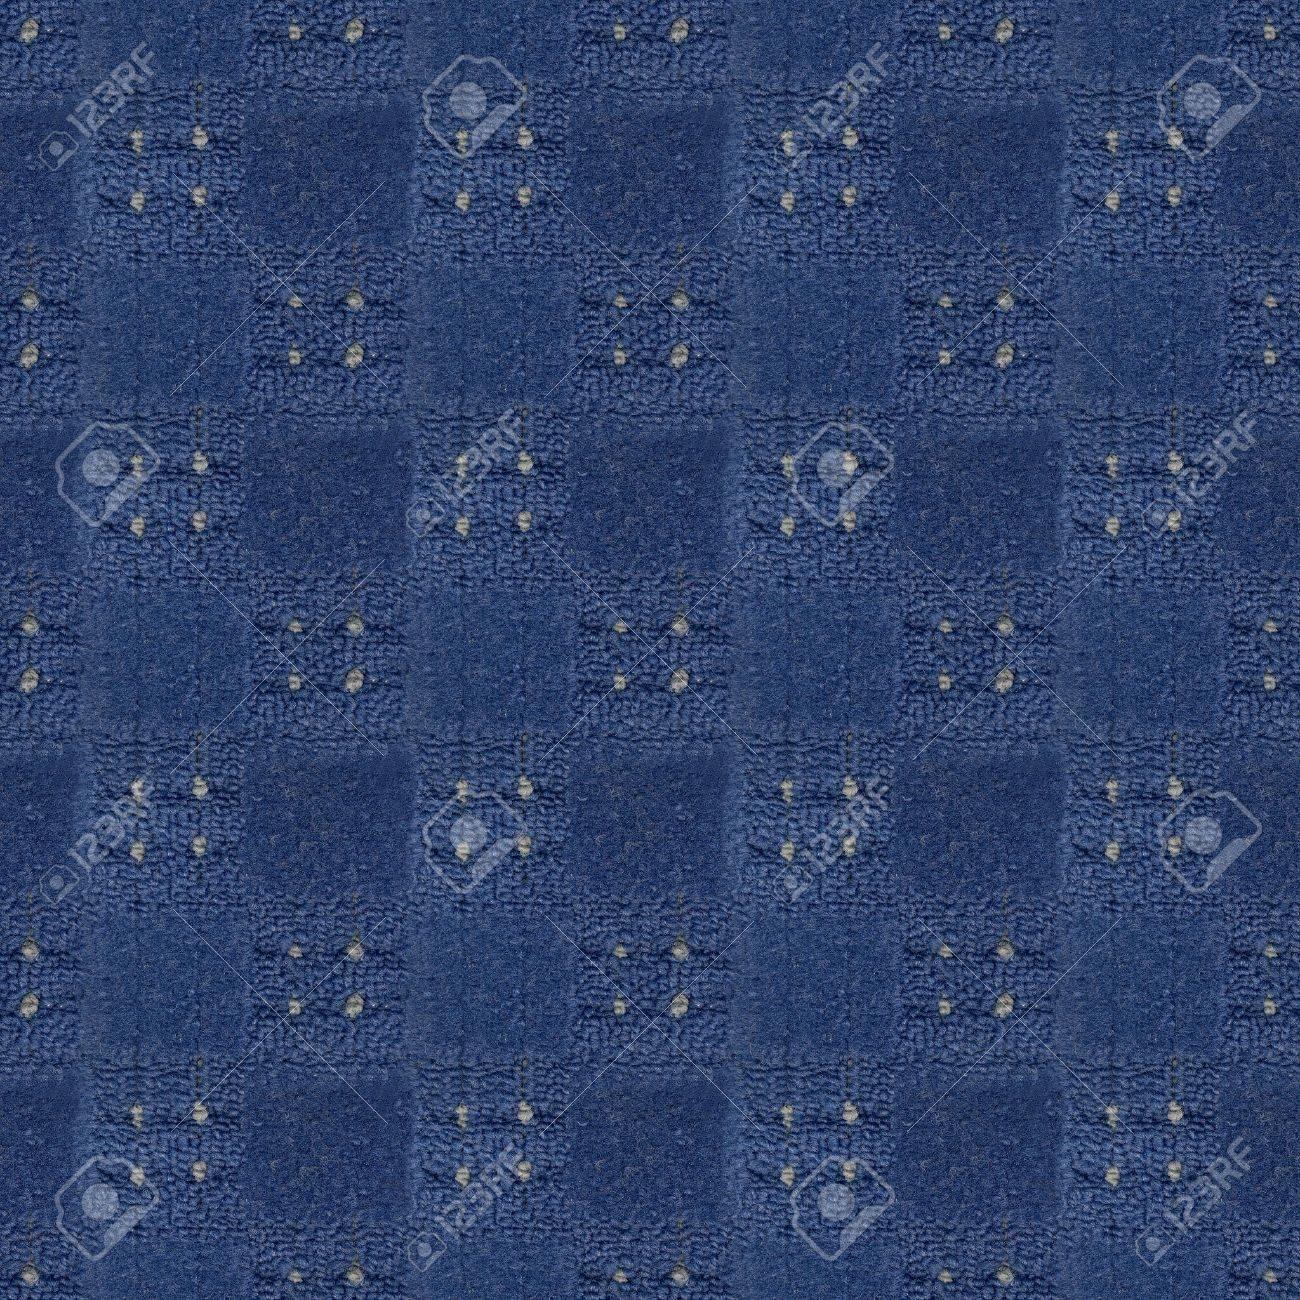 carpet flooring texture. Background Of Carpet Material Pattern Texture Flooring Stock Photo - 11550806